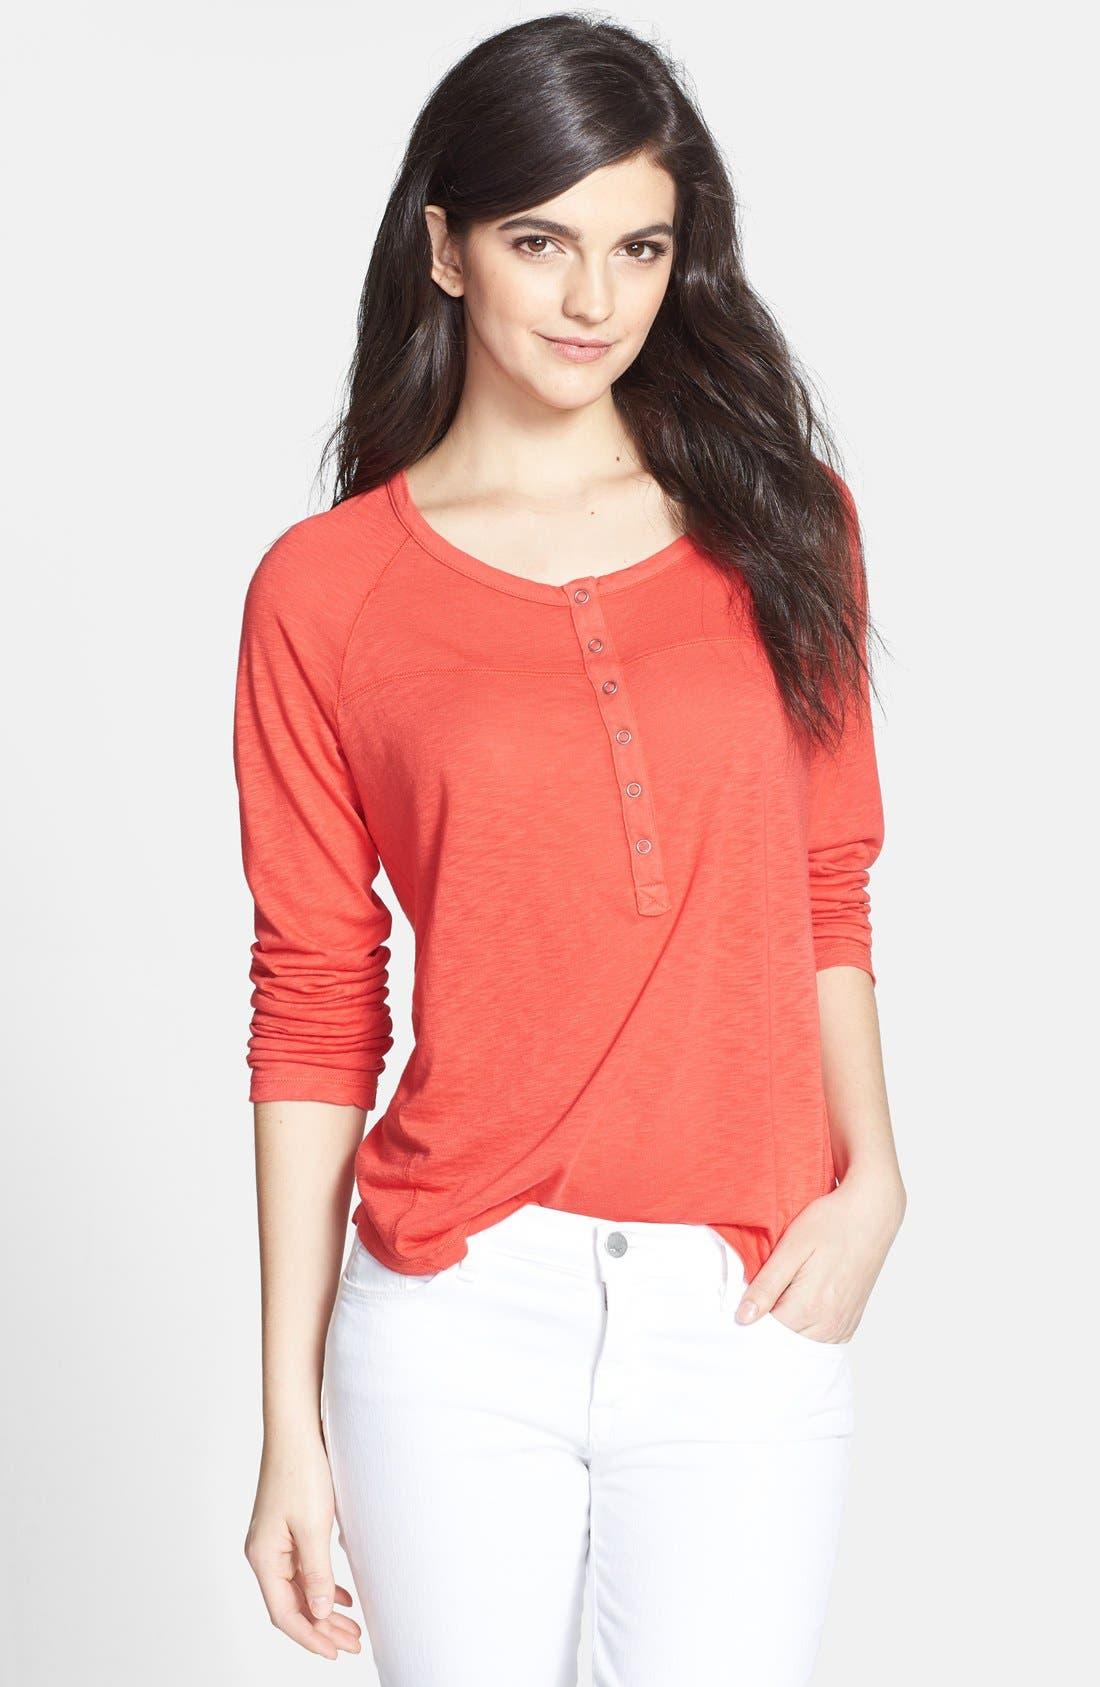 Main Image - Splendid Slub Knit Cotton Blend Top